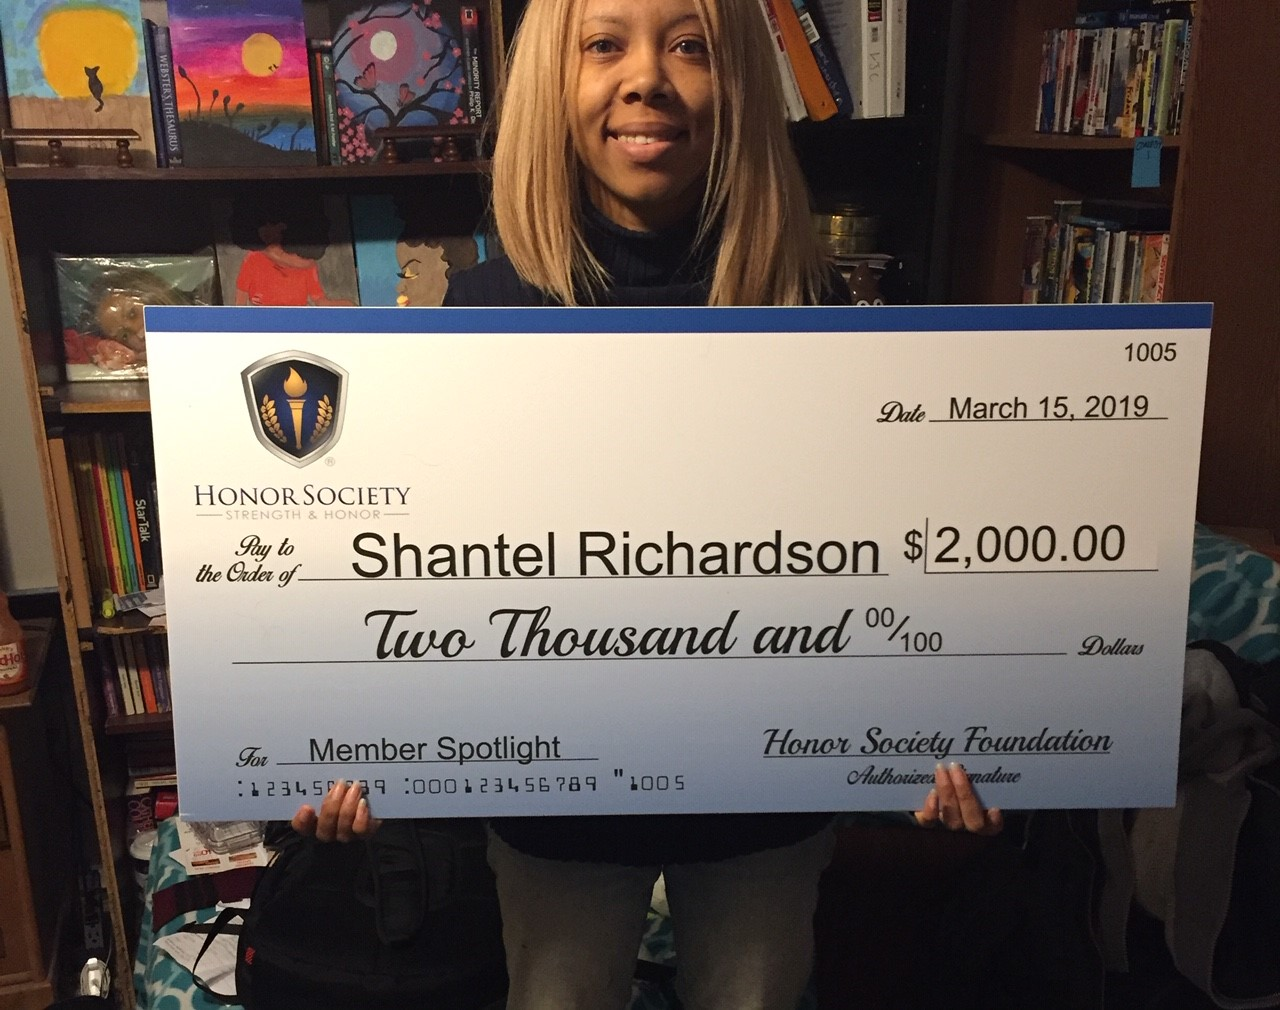 Shantal Richardson is the recipient of the Honor Society Foundation $2,000 Member spotlight recipient.